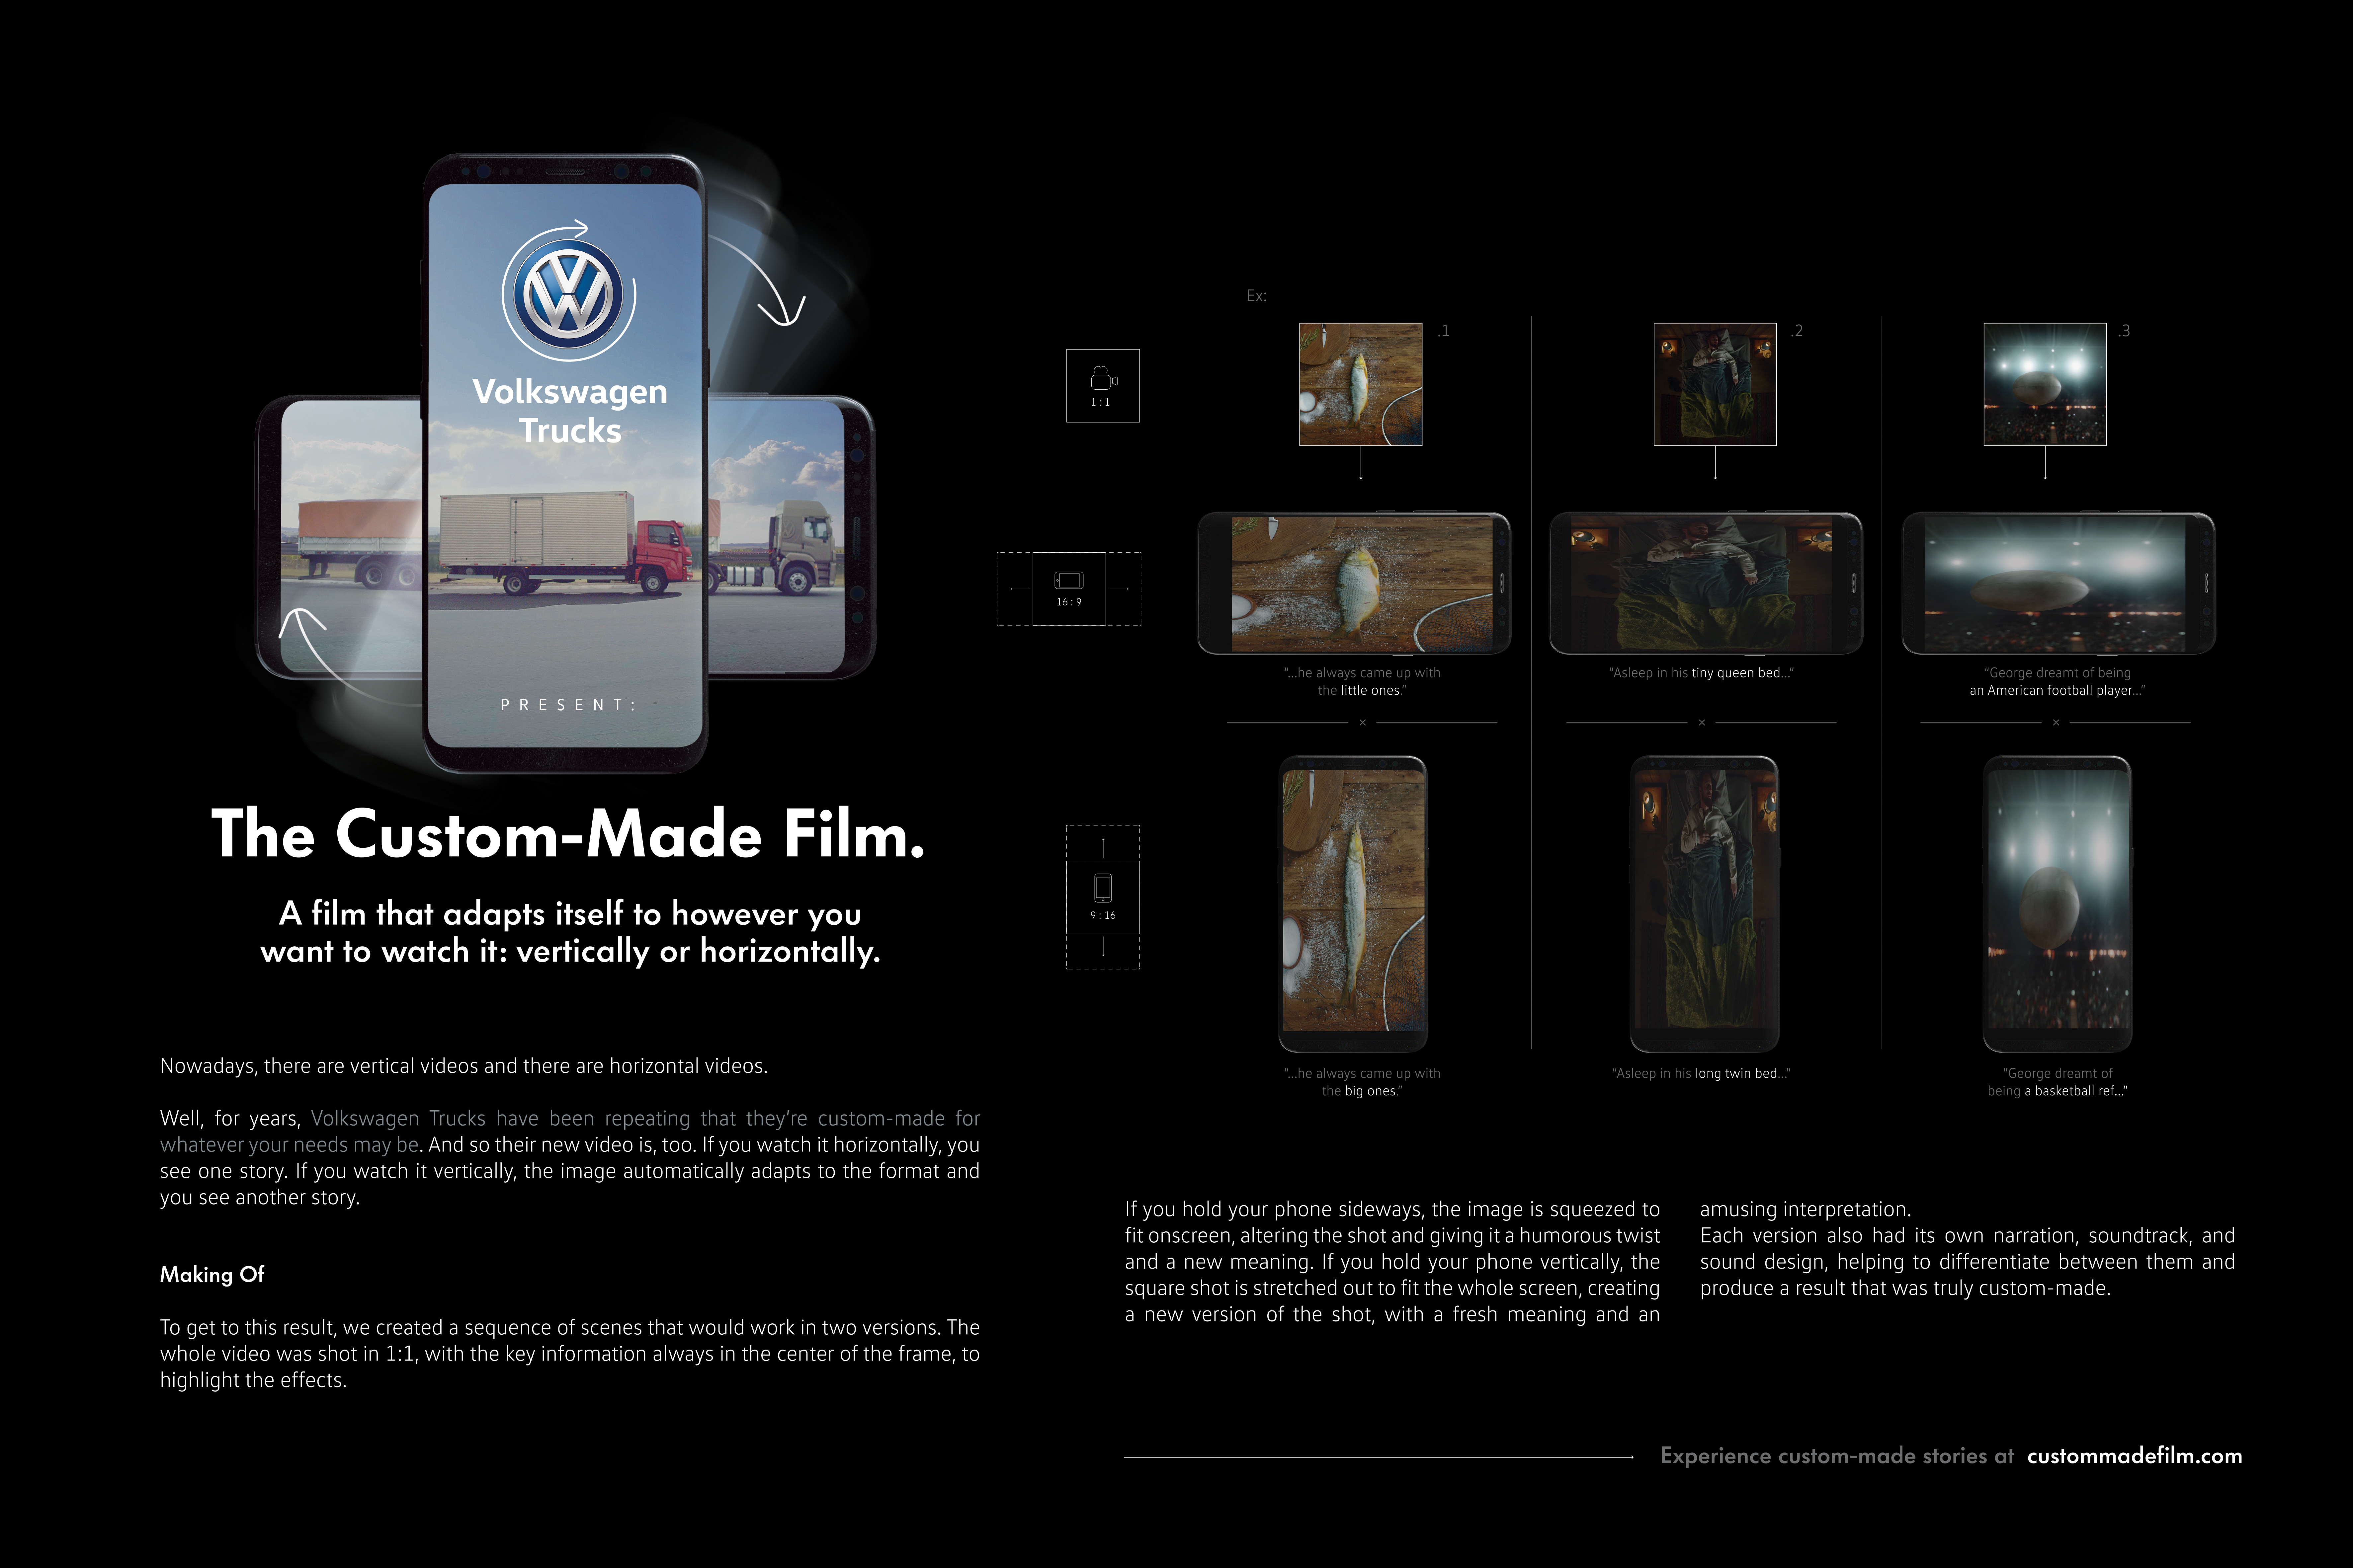 The custom-made film Thumbnail